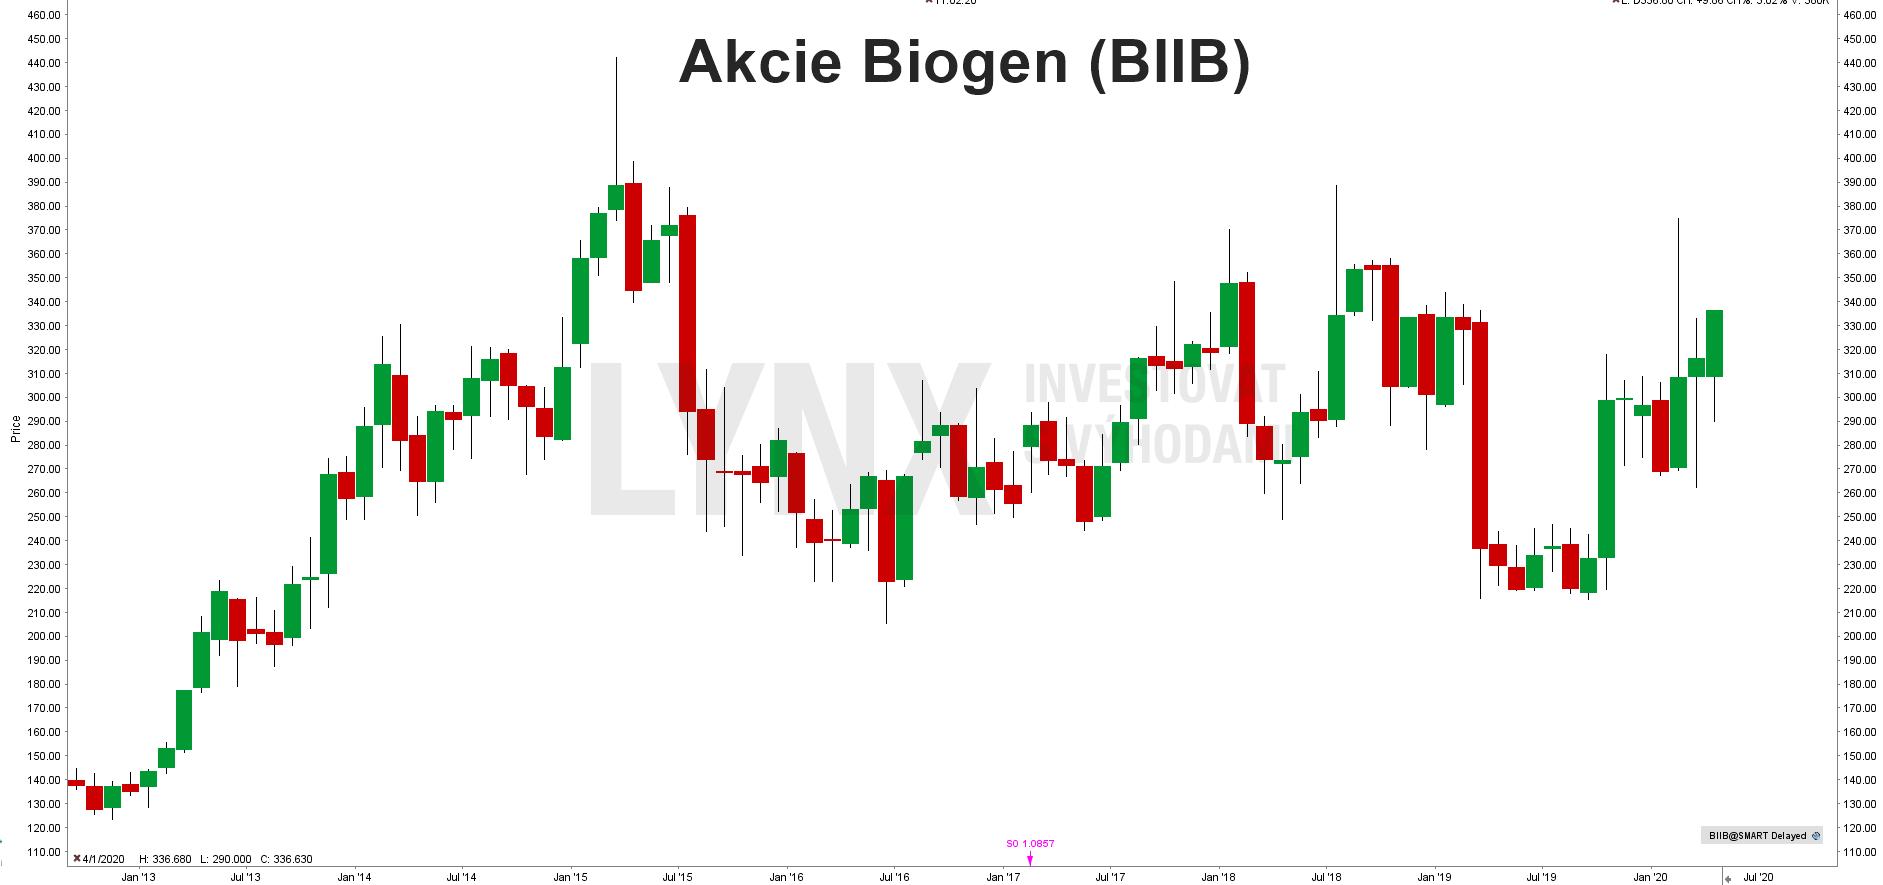 Akcie Biogen